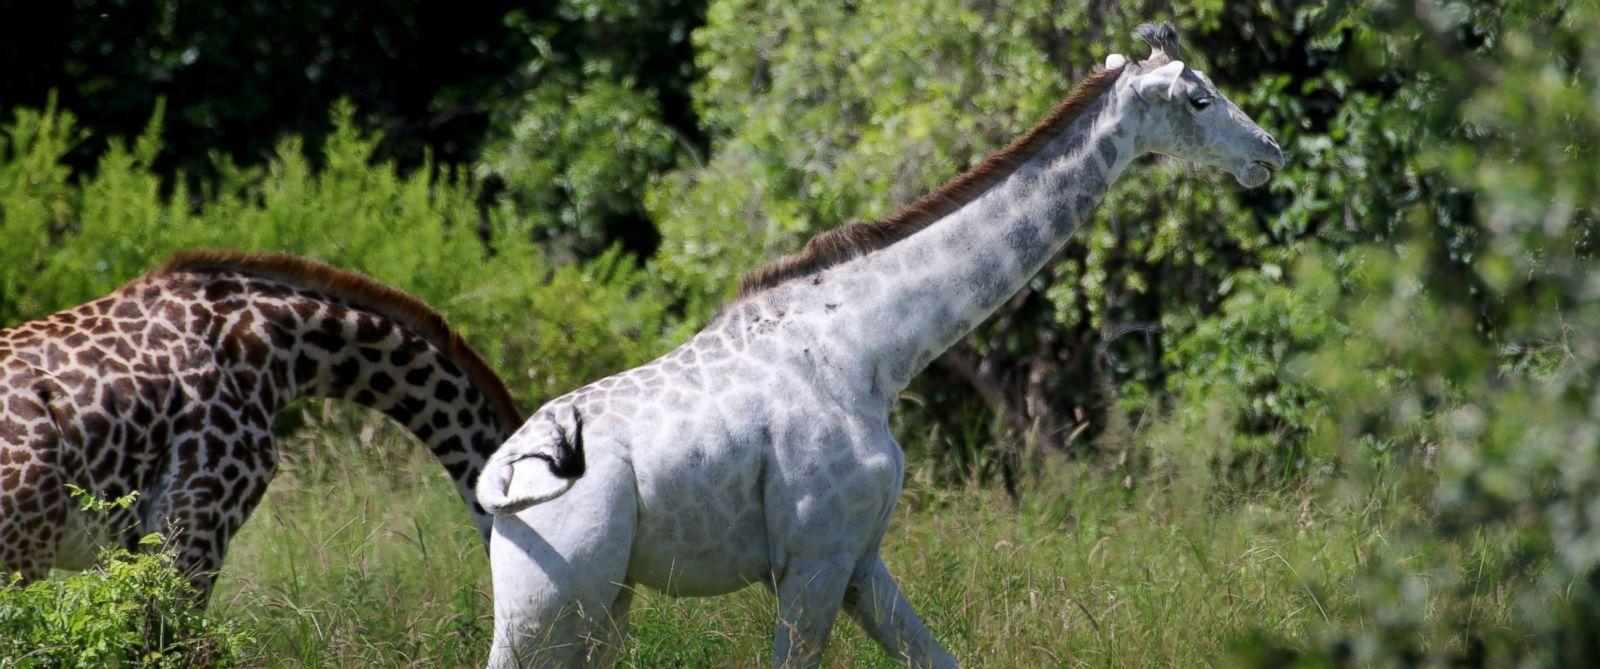 PHOTO: Omo the white giraffe is seen here in Tarangire National Park in Tanzania, Africa, Jan. 17, 2016.